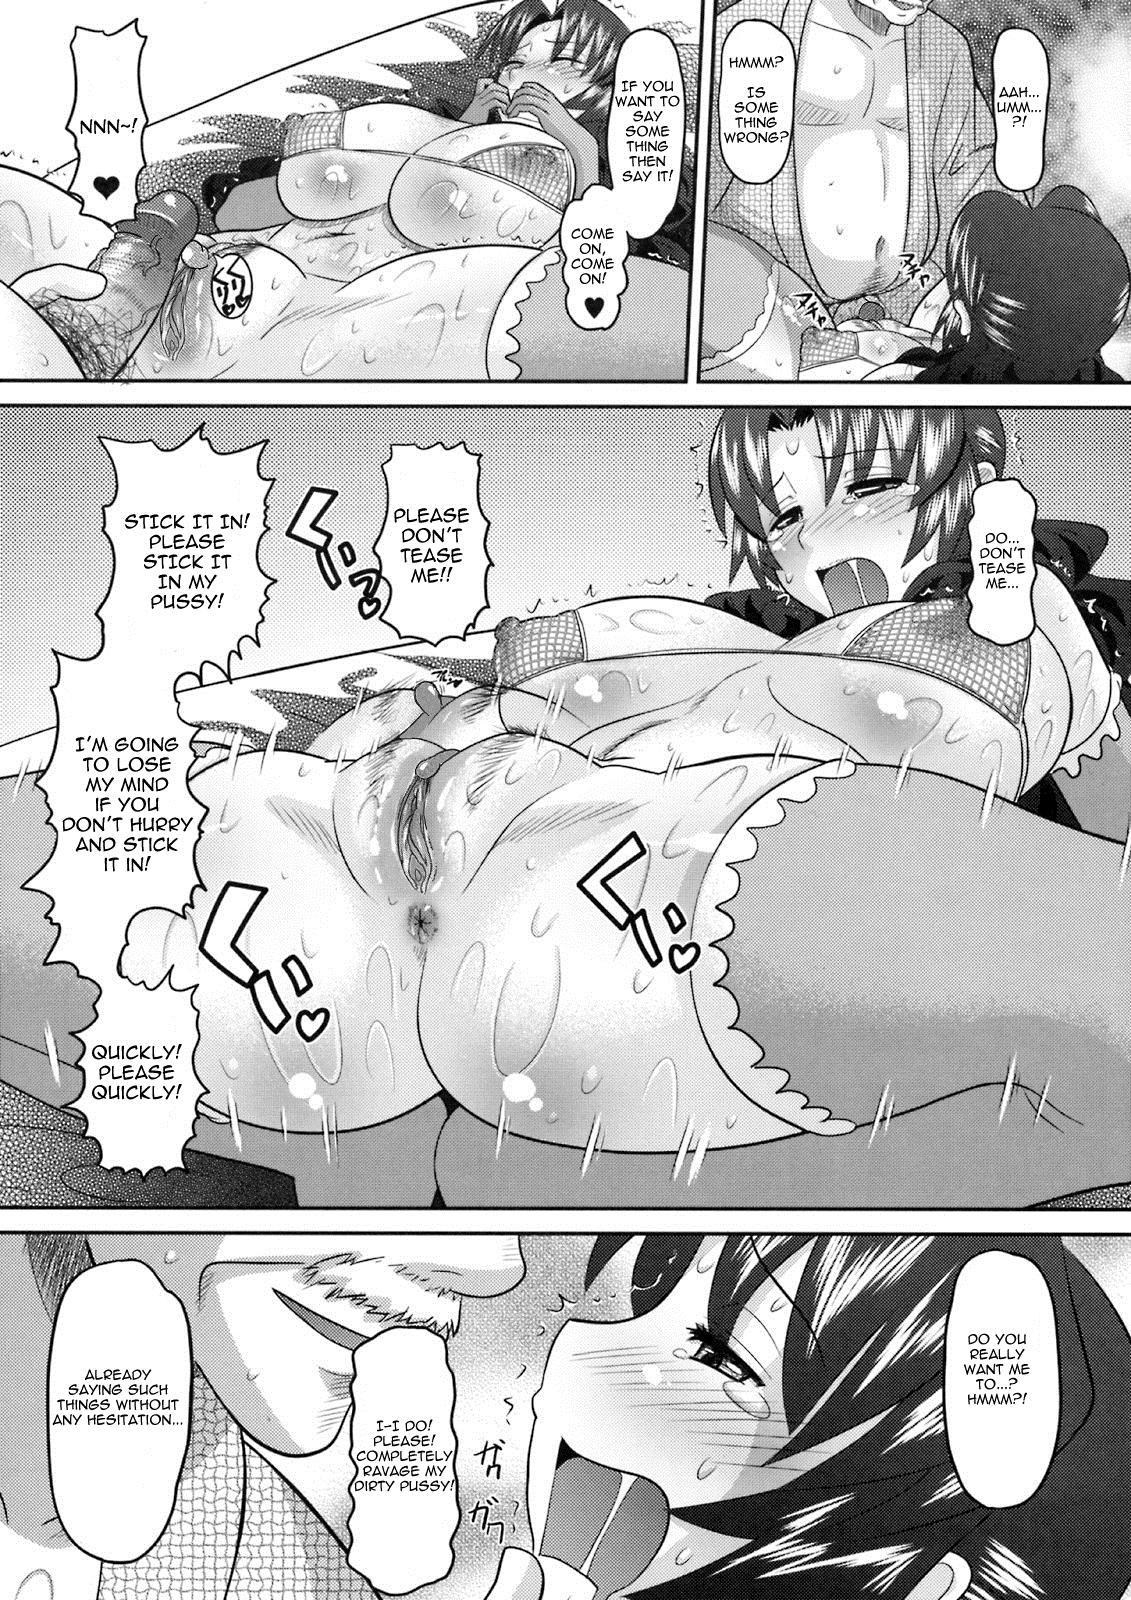 Shinzui Volume 8 Chapter 1 10